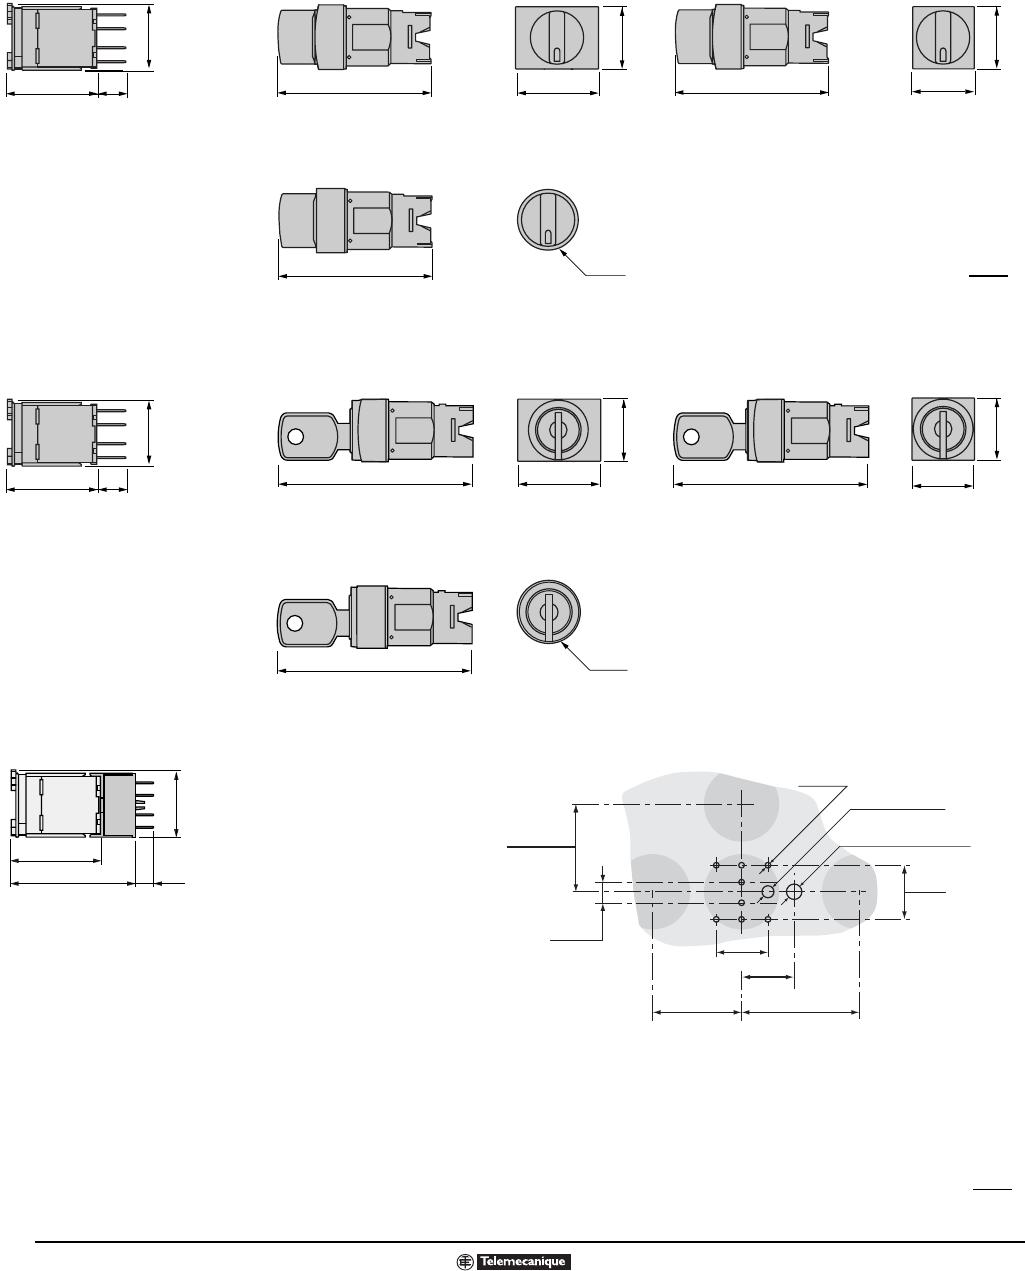 9001ct0001 1000508696 Catalog Rocker Switch Diagram 28emtd 30 Amp Toggle 28